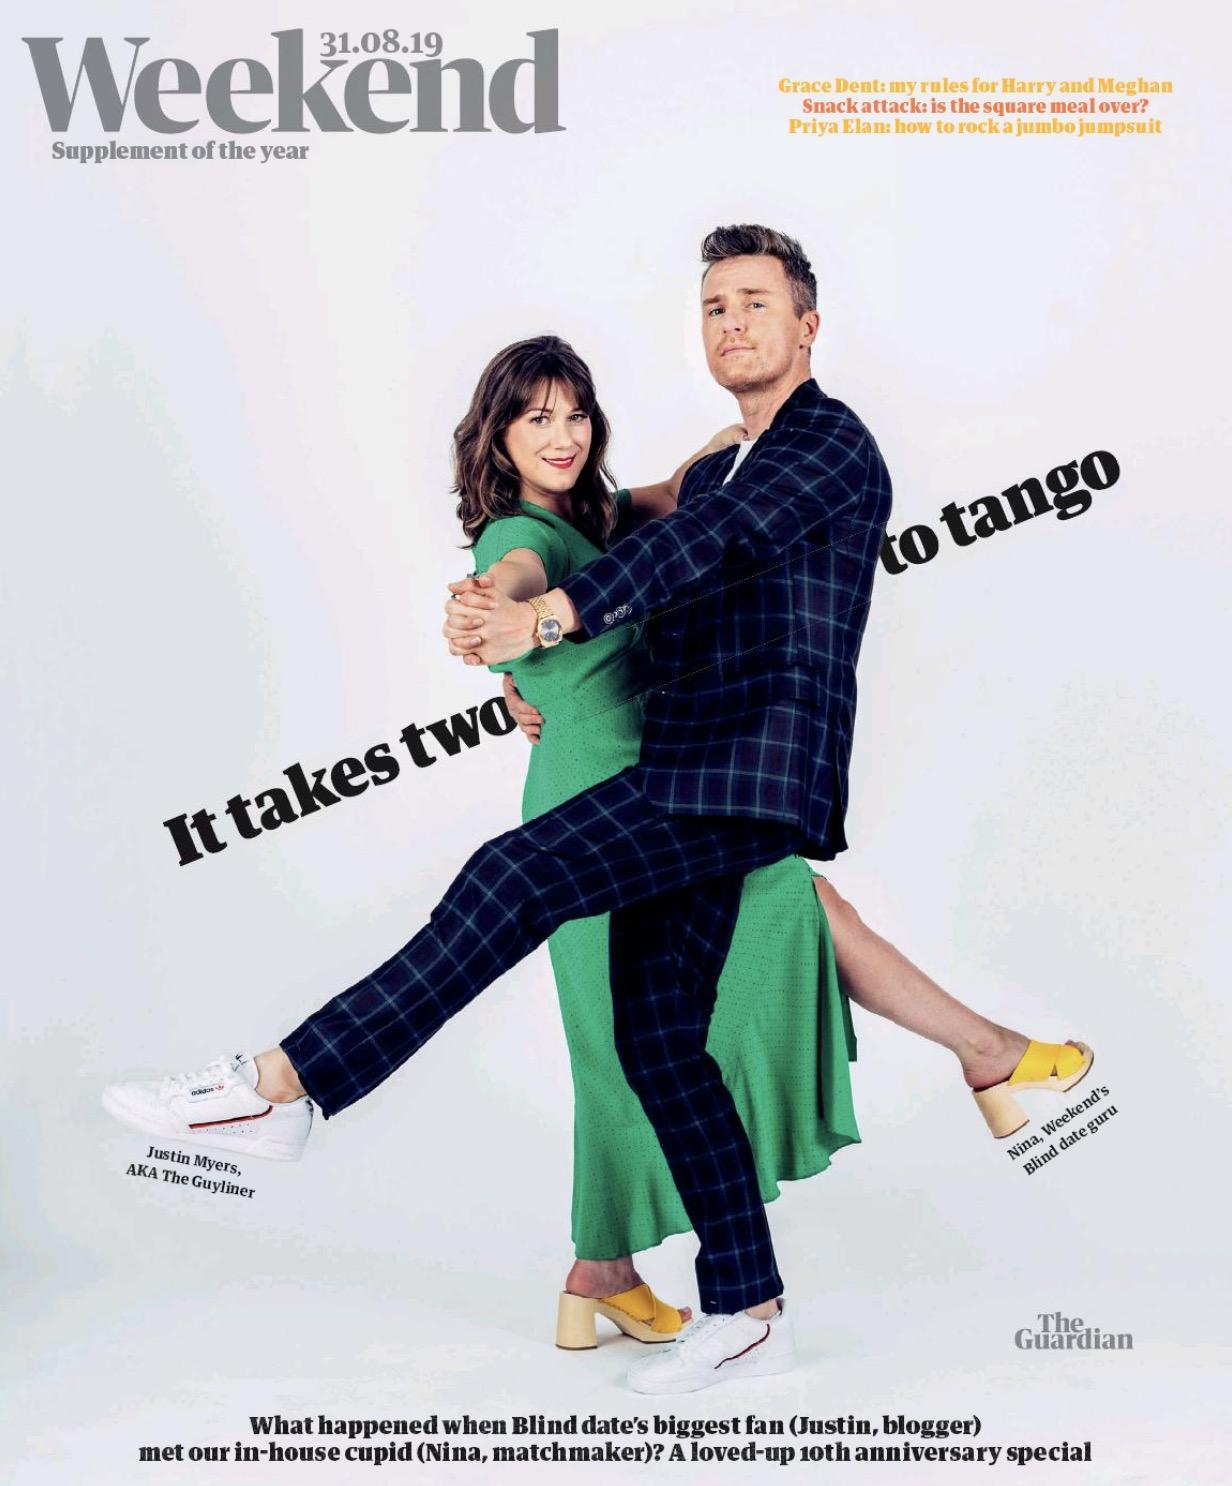 The Guardian Weekend 31-08-2019 Cover.jpg